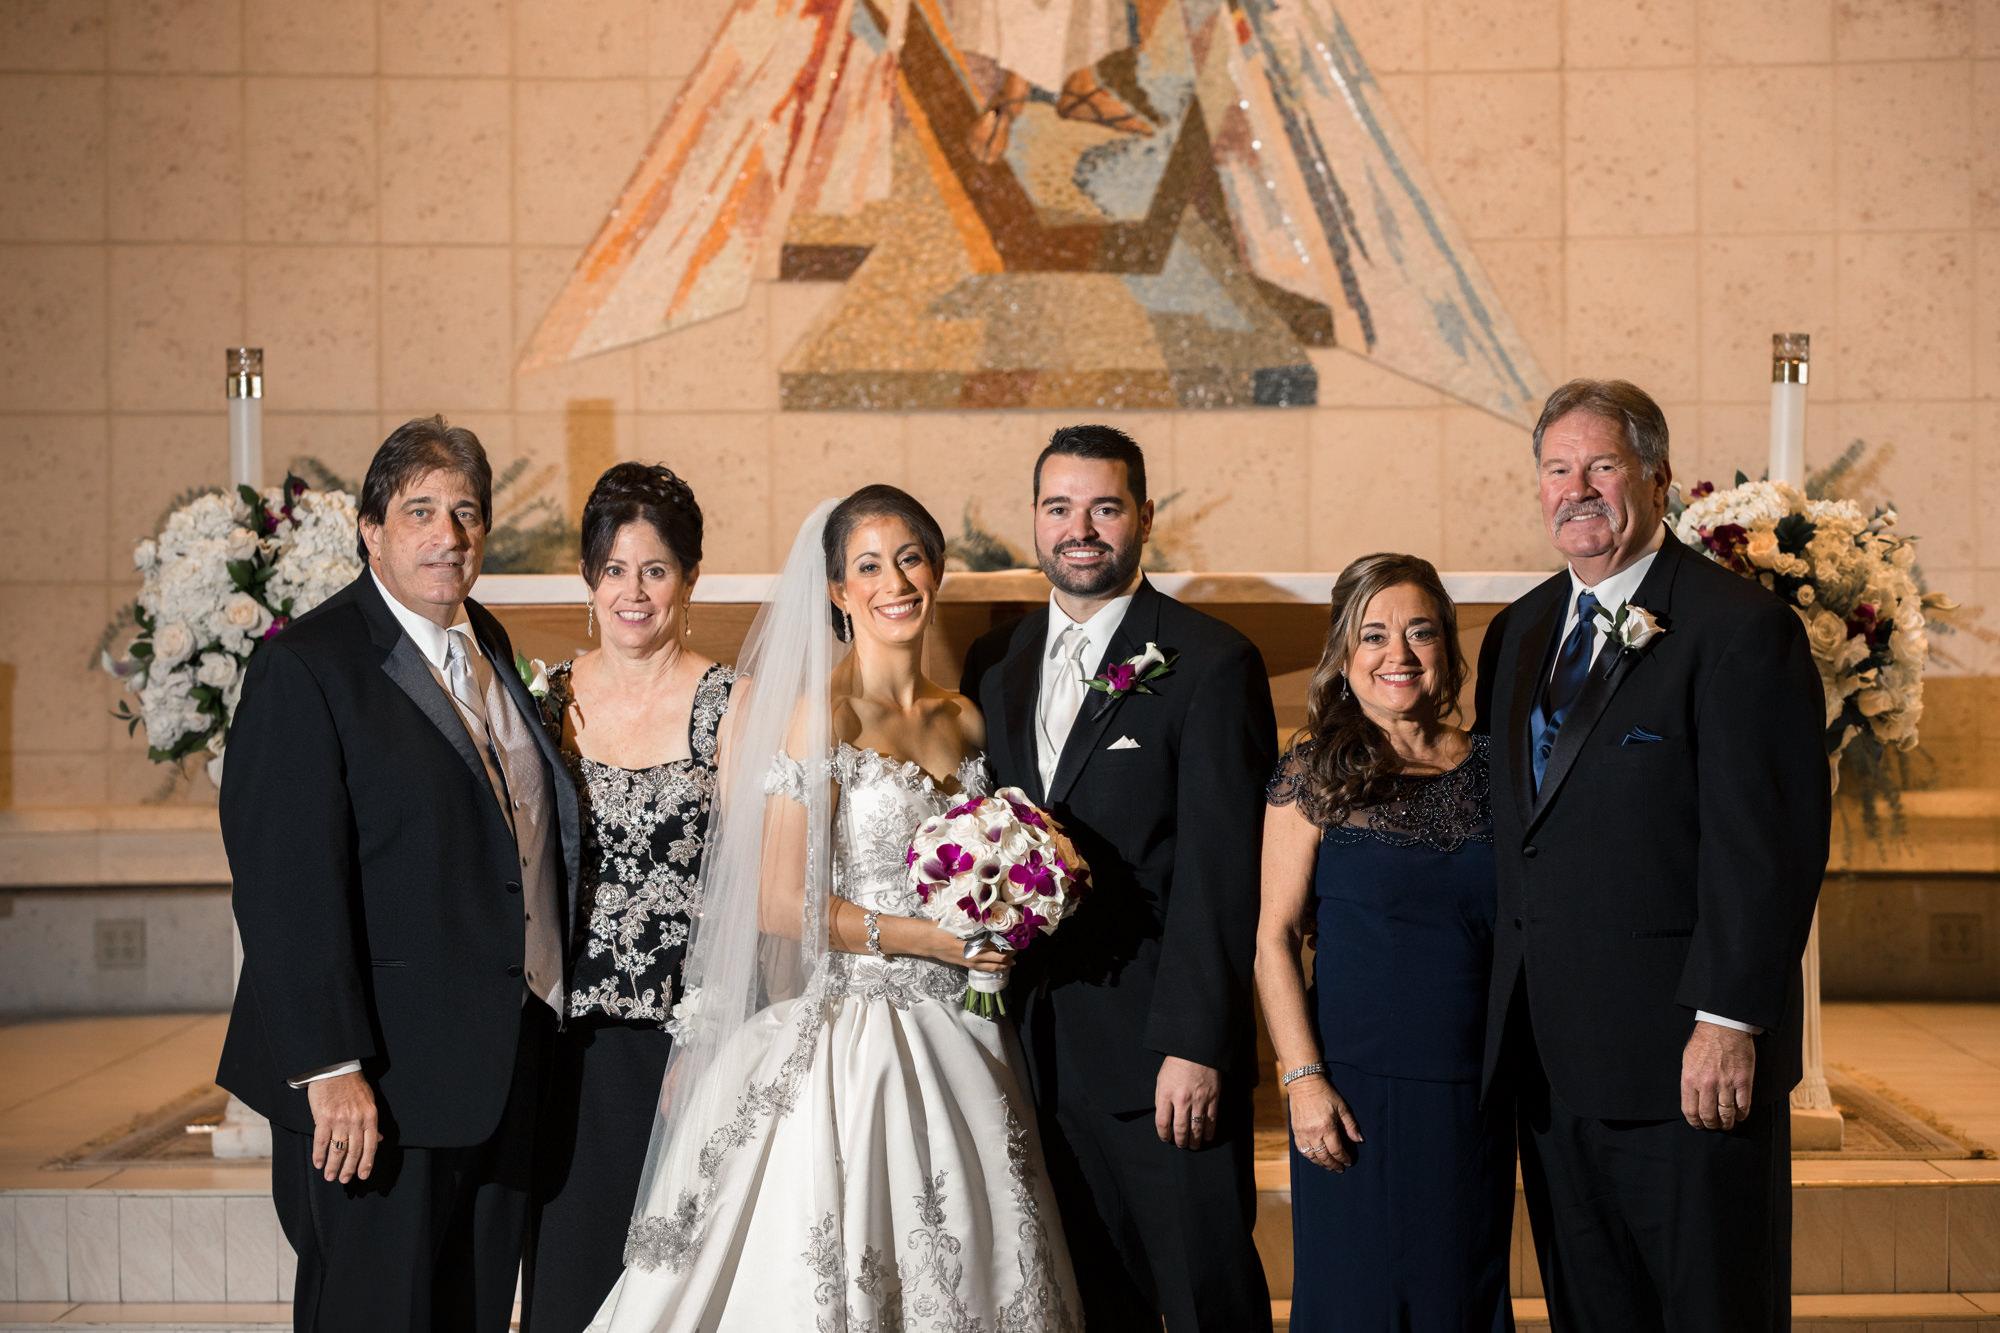 Benvenuto_Wedding_catholic_Florida_Bride-Groom-58.jpg